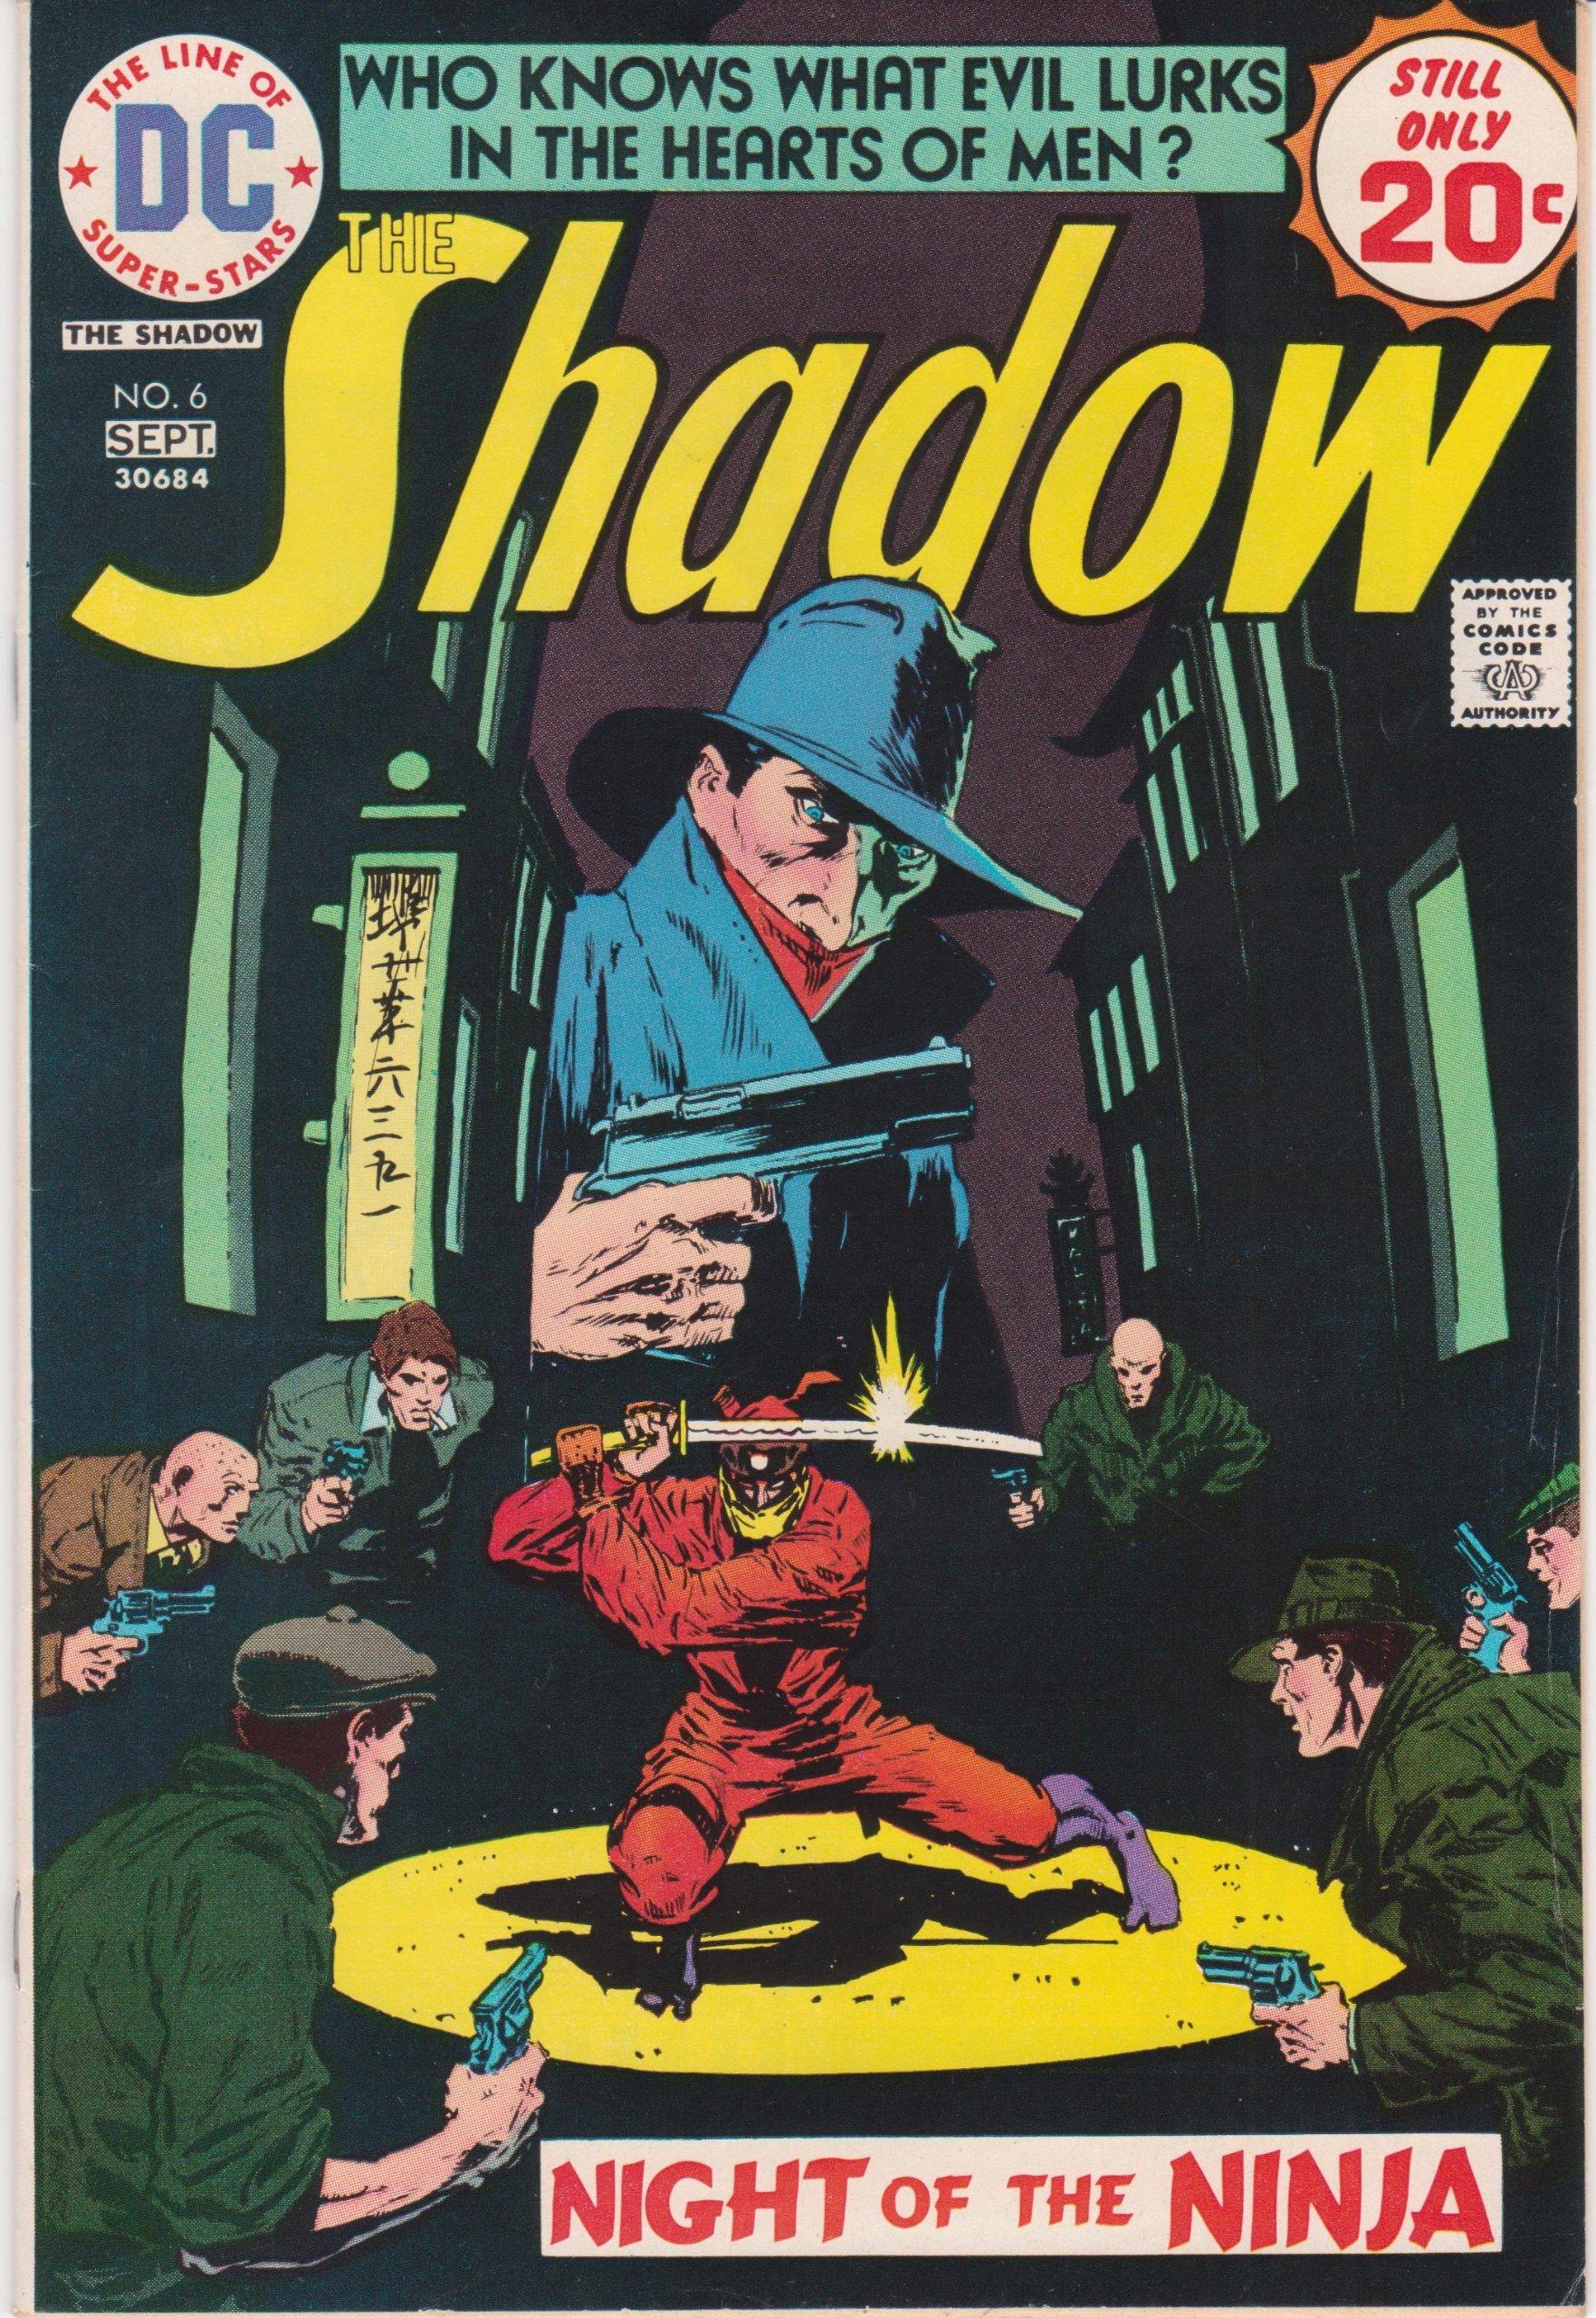 Amazon.com: The Shadow #6 August / September 1974 DC Comics ...